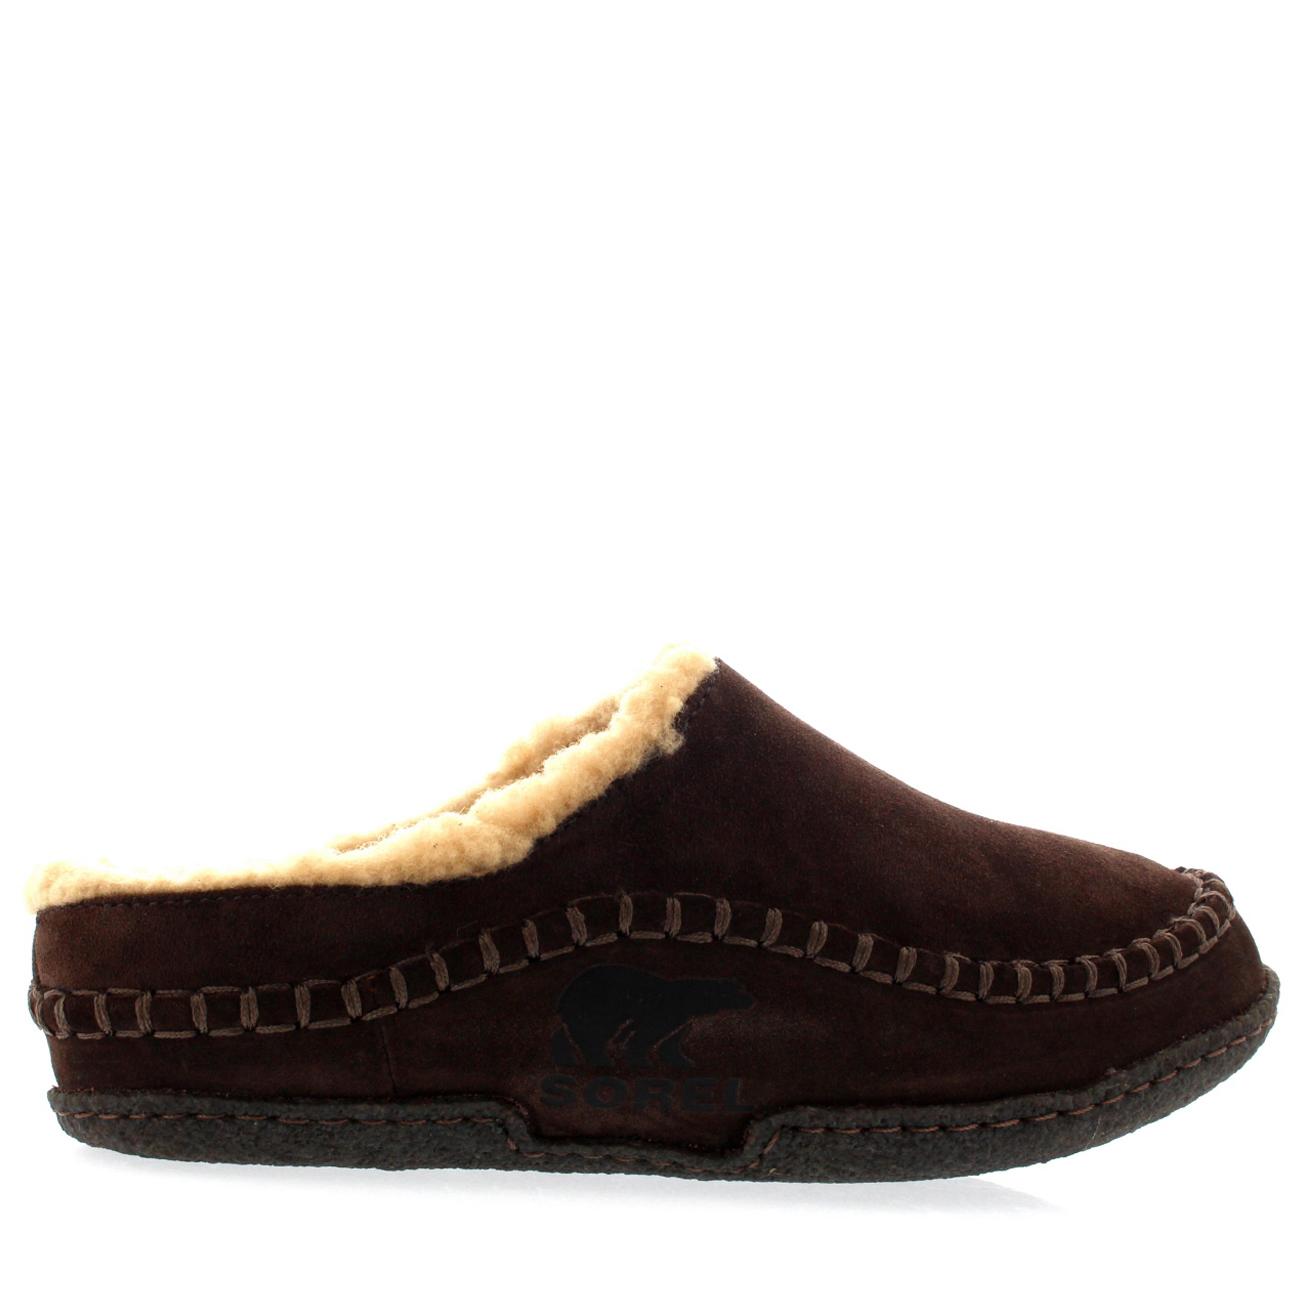 mens sorel falcon ridge casual fur suede winter shoes house slippers